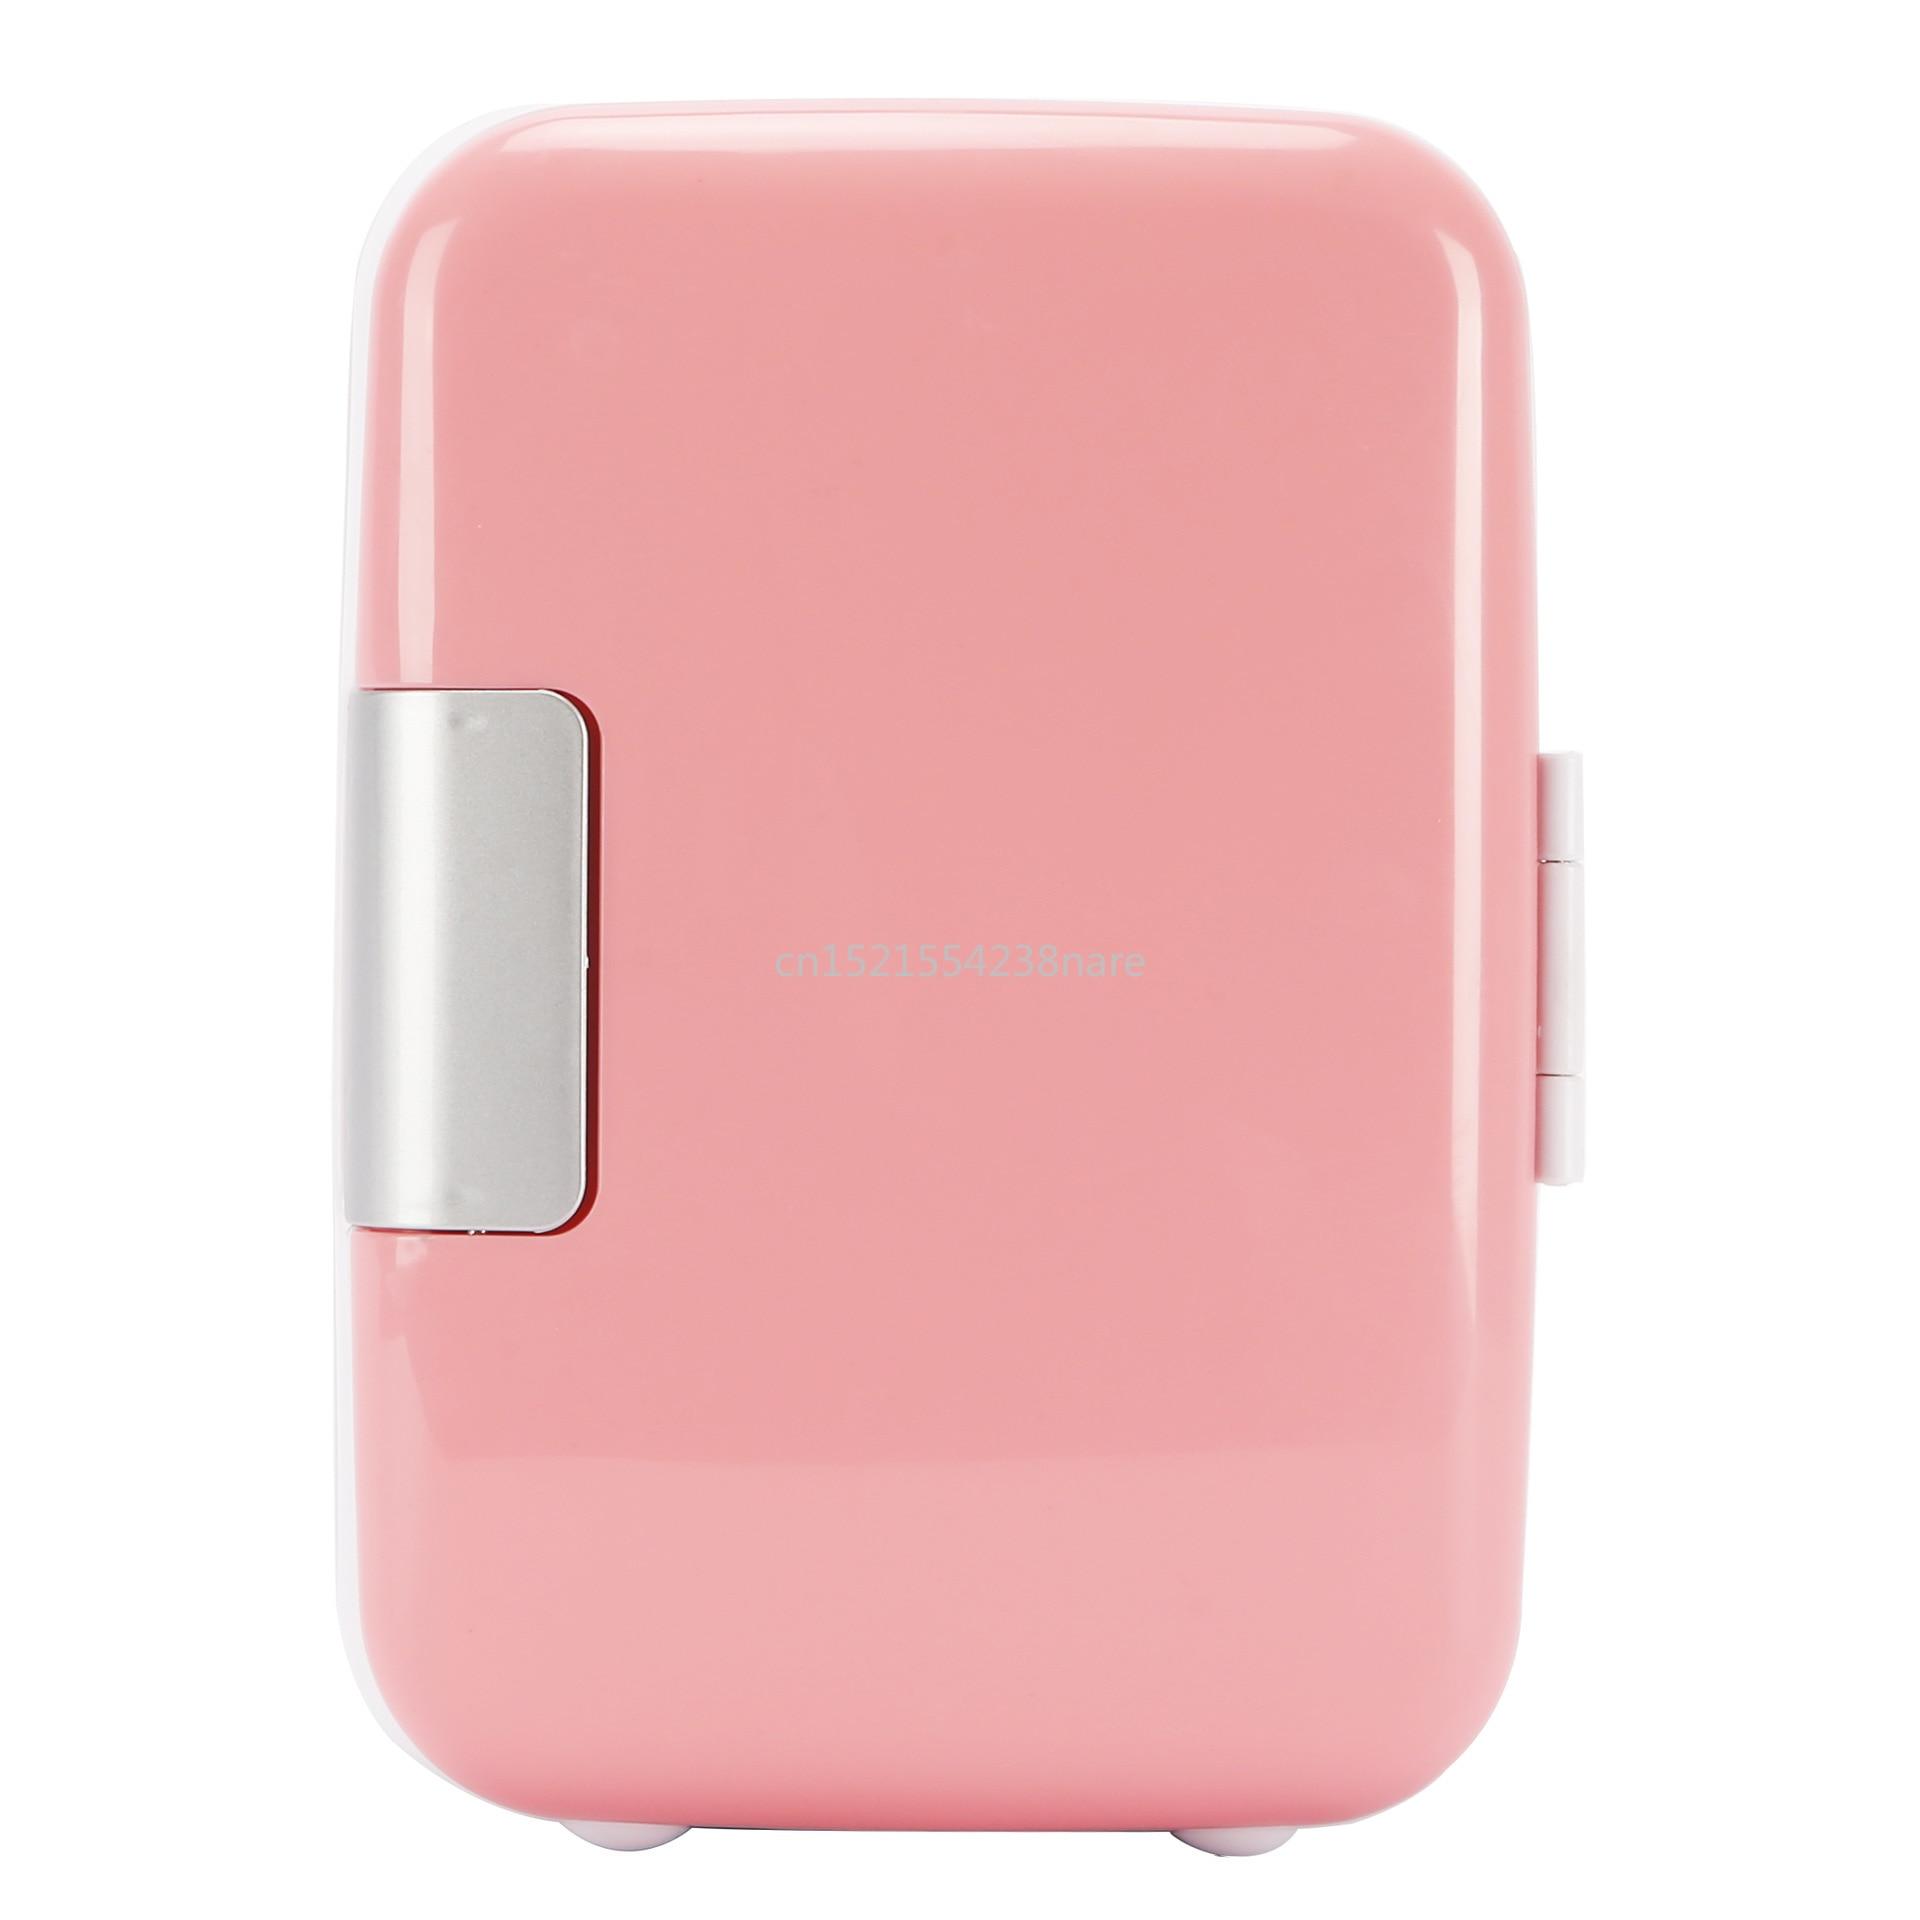 22%,pink 4L Mini Home Car Fridge Mobile Refrigerator Mute Food Grade PP Freezer ABS Aluminum 5-65 Celsius Cold/warm Box